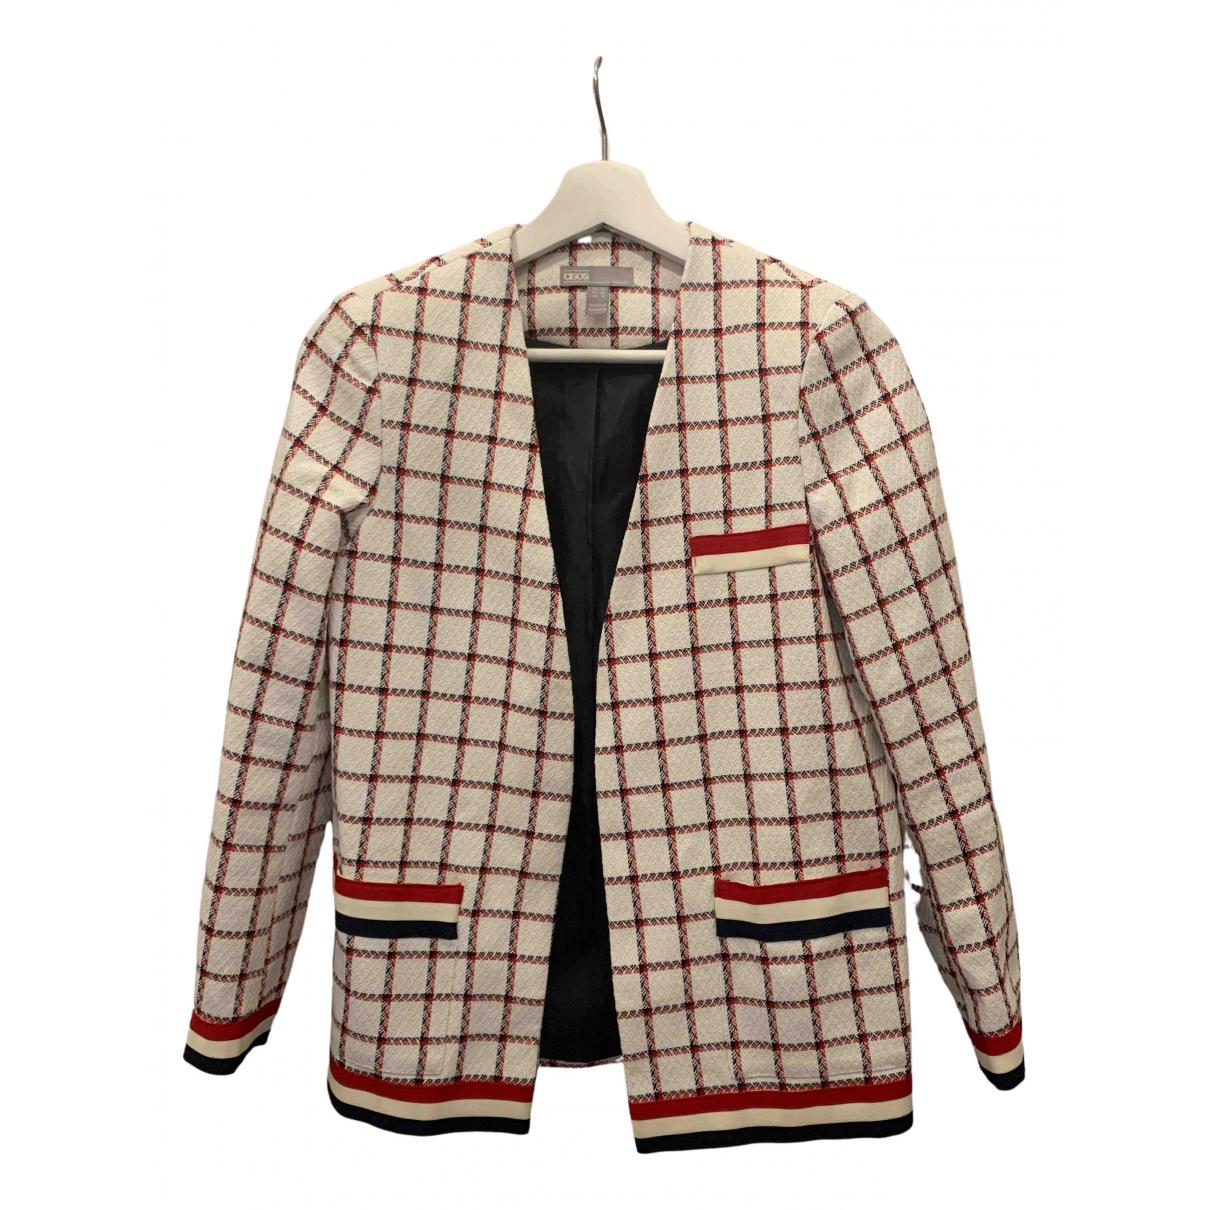 Asos N Multicolour Cotton jacket for Women 4 UK